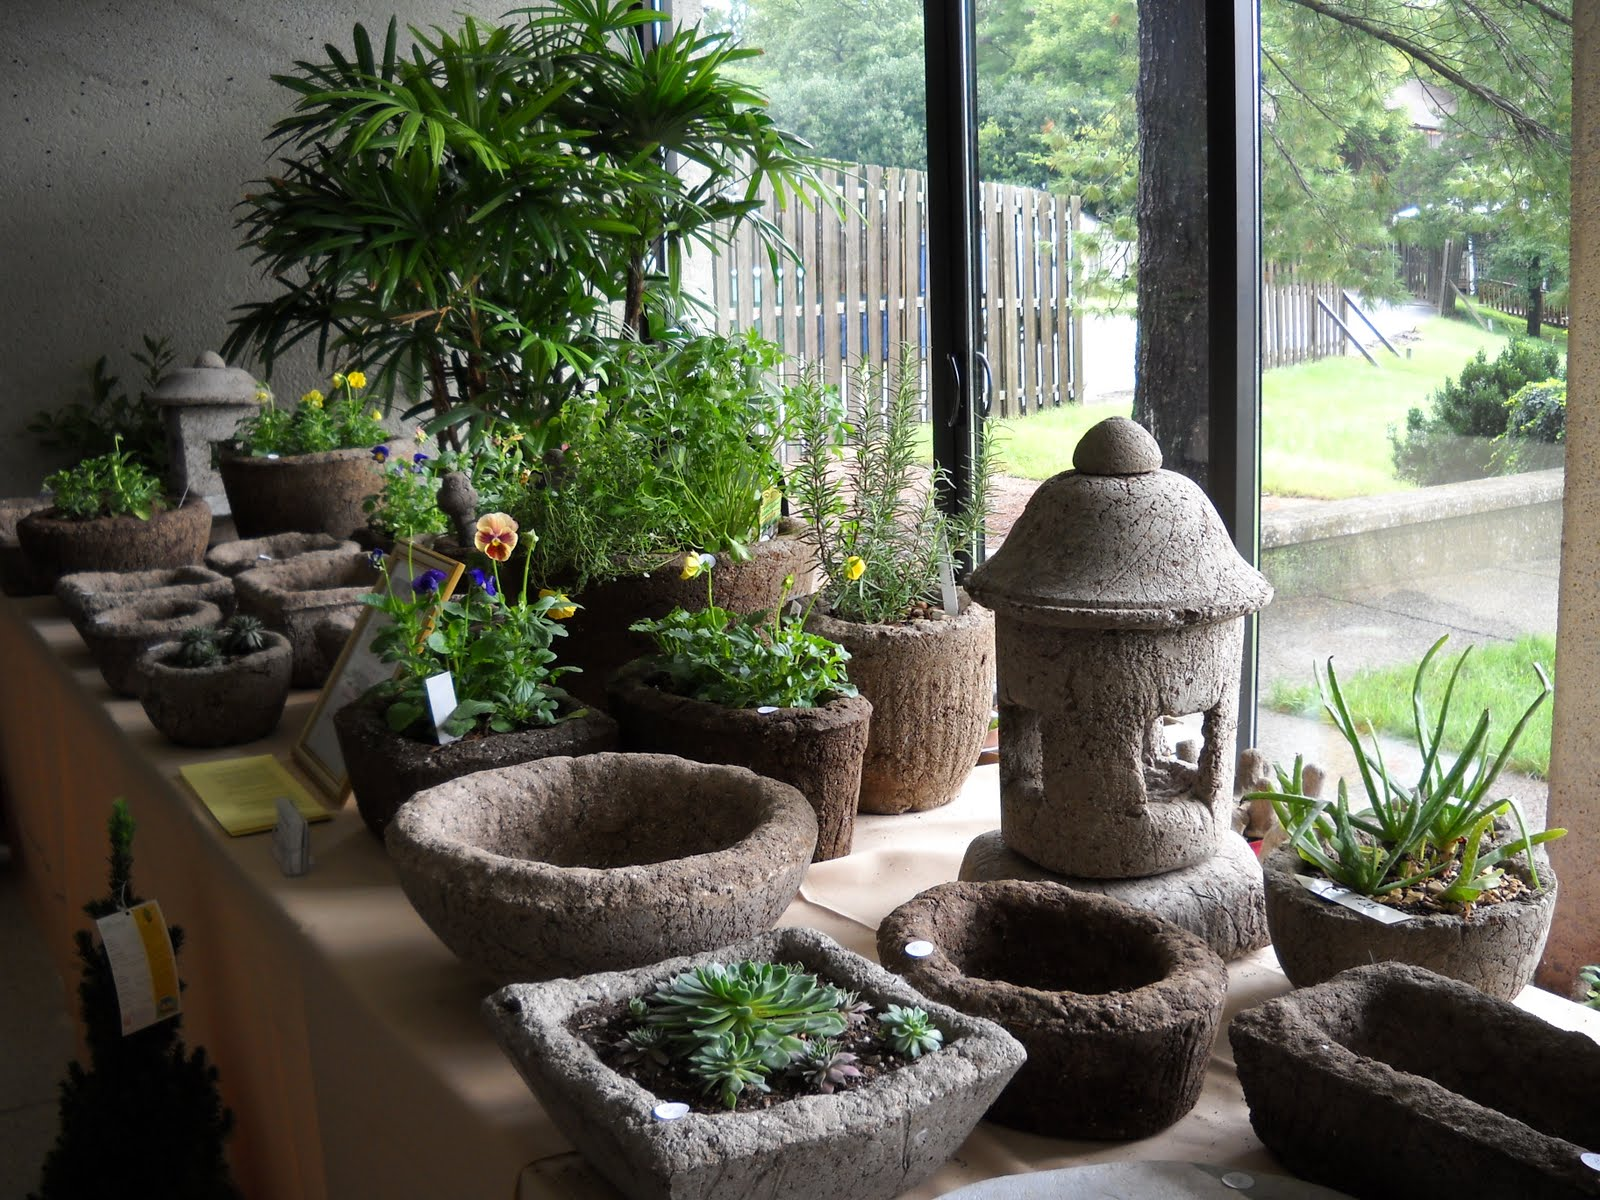 STONE ARTISANS Garden Ornaments And Planters - Japanese garden ornaments